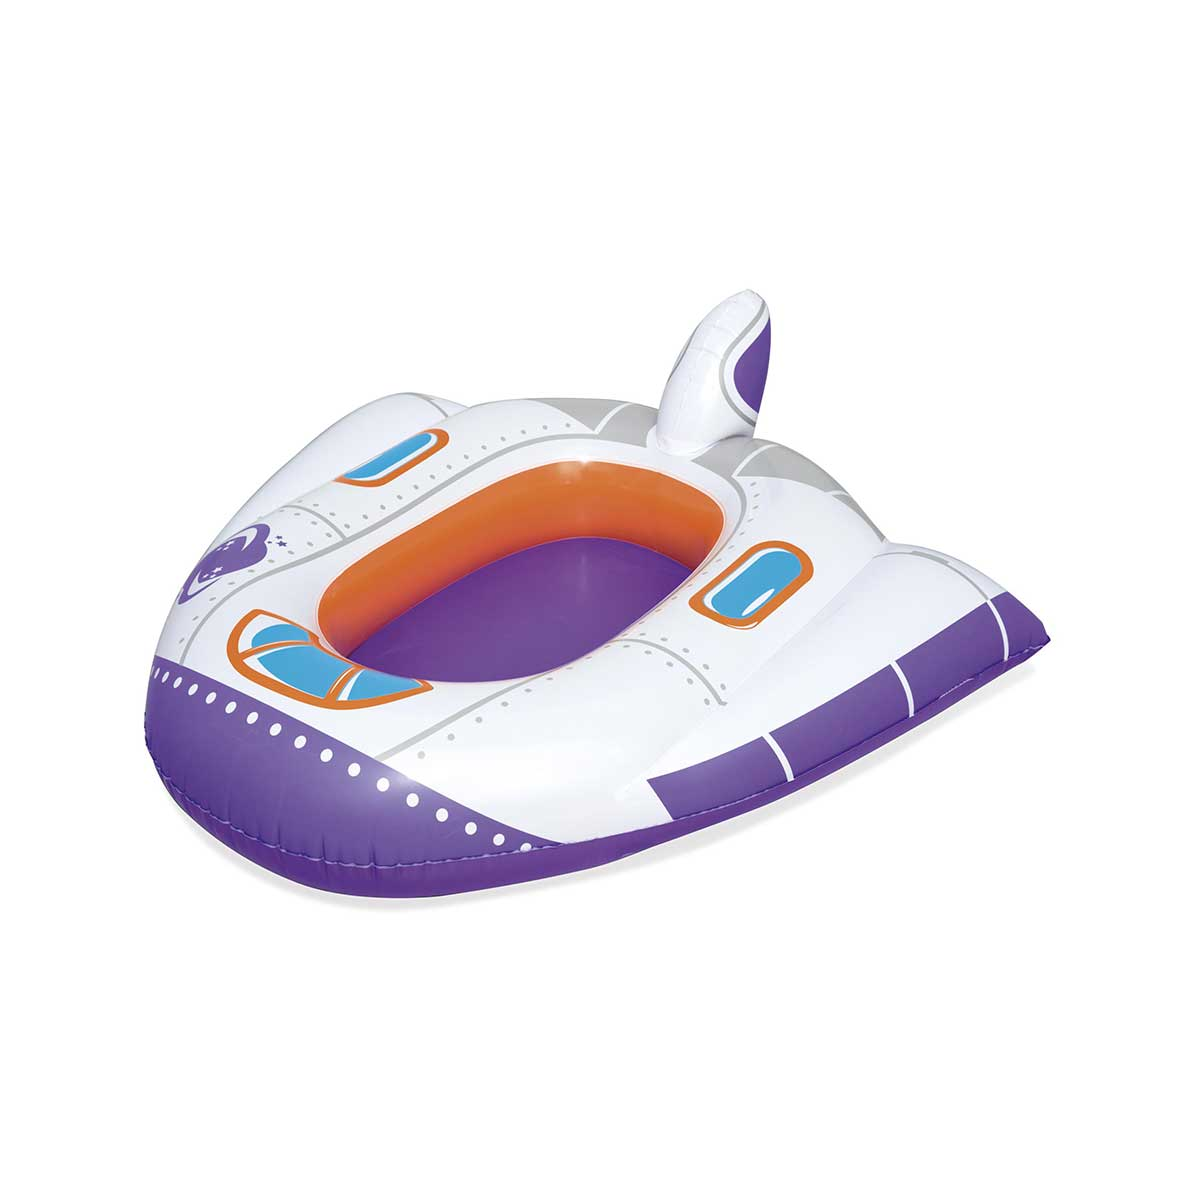 Cruiser Baby badbåt